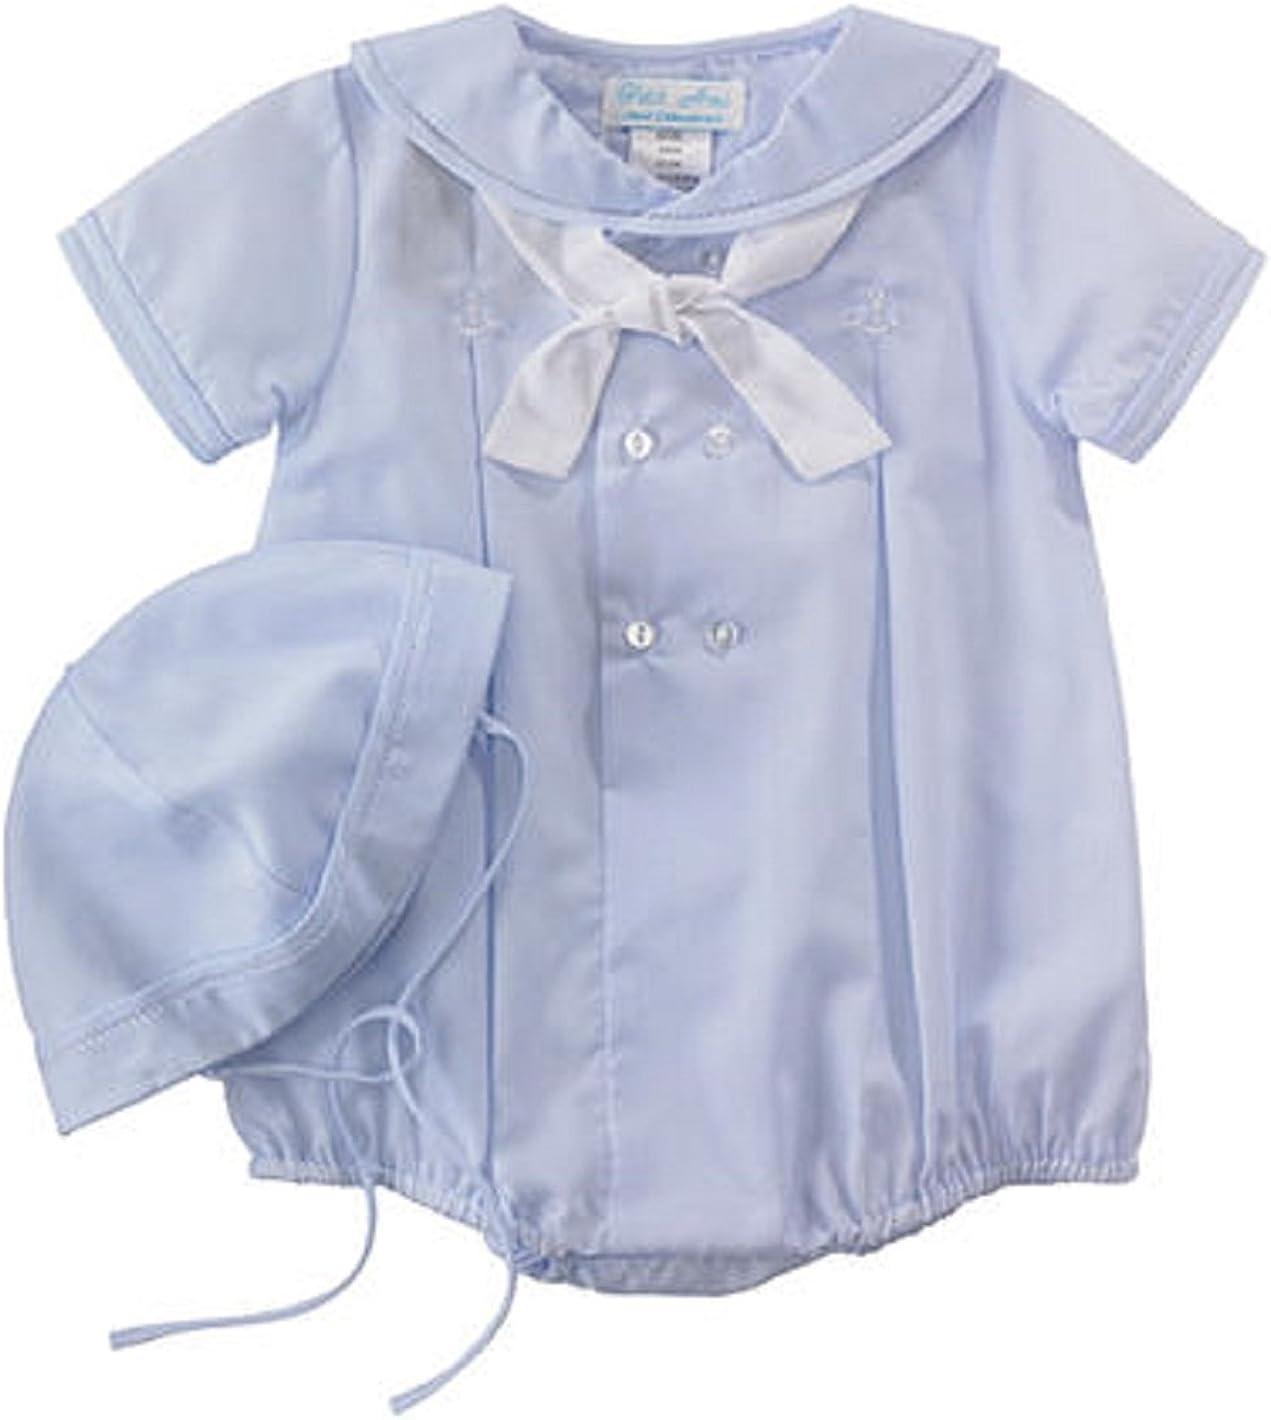 Mri-le1 Baby Girl Organic Coverall Melanoma Awareness Flag-1 Baby Rompers